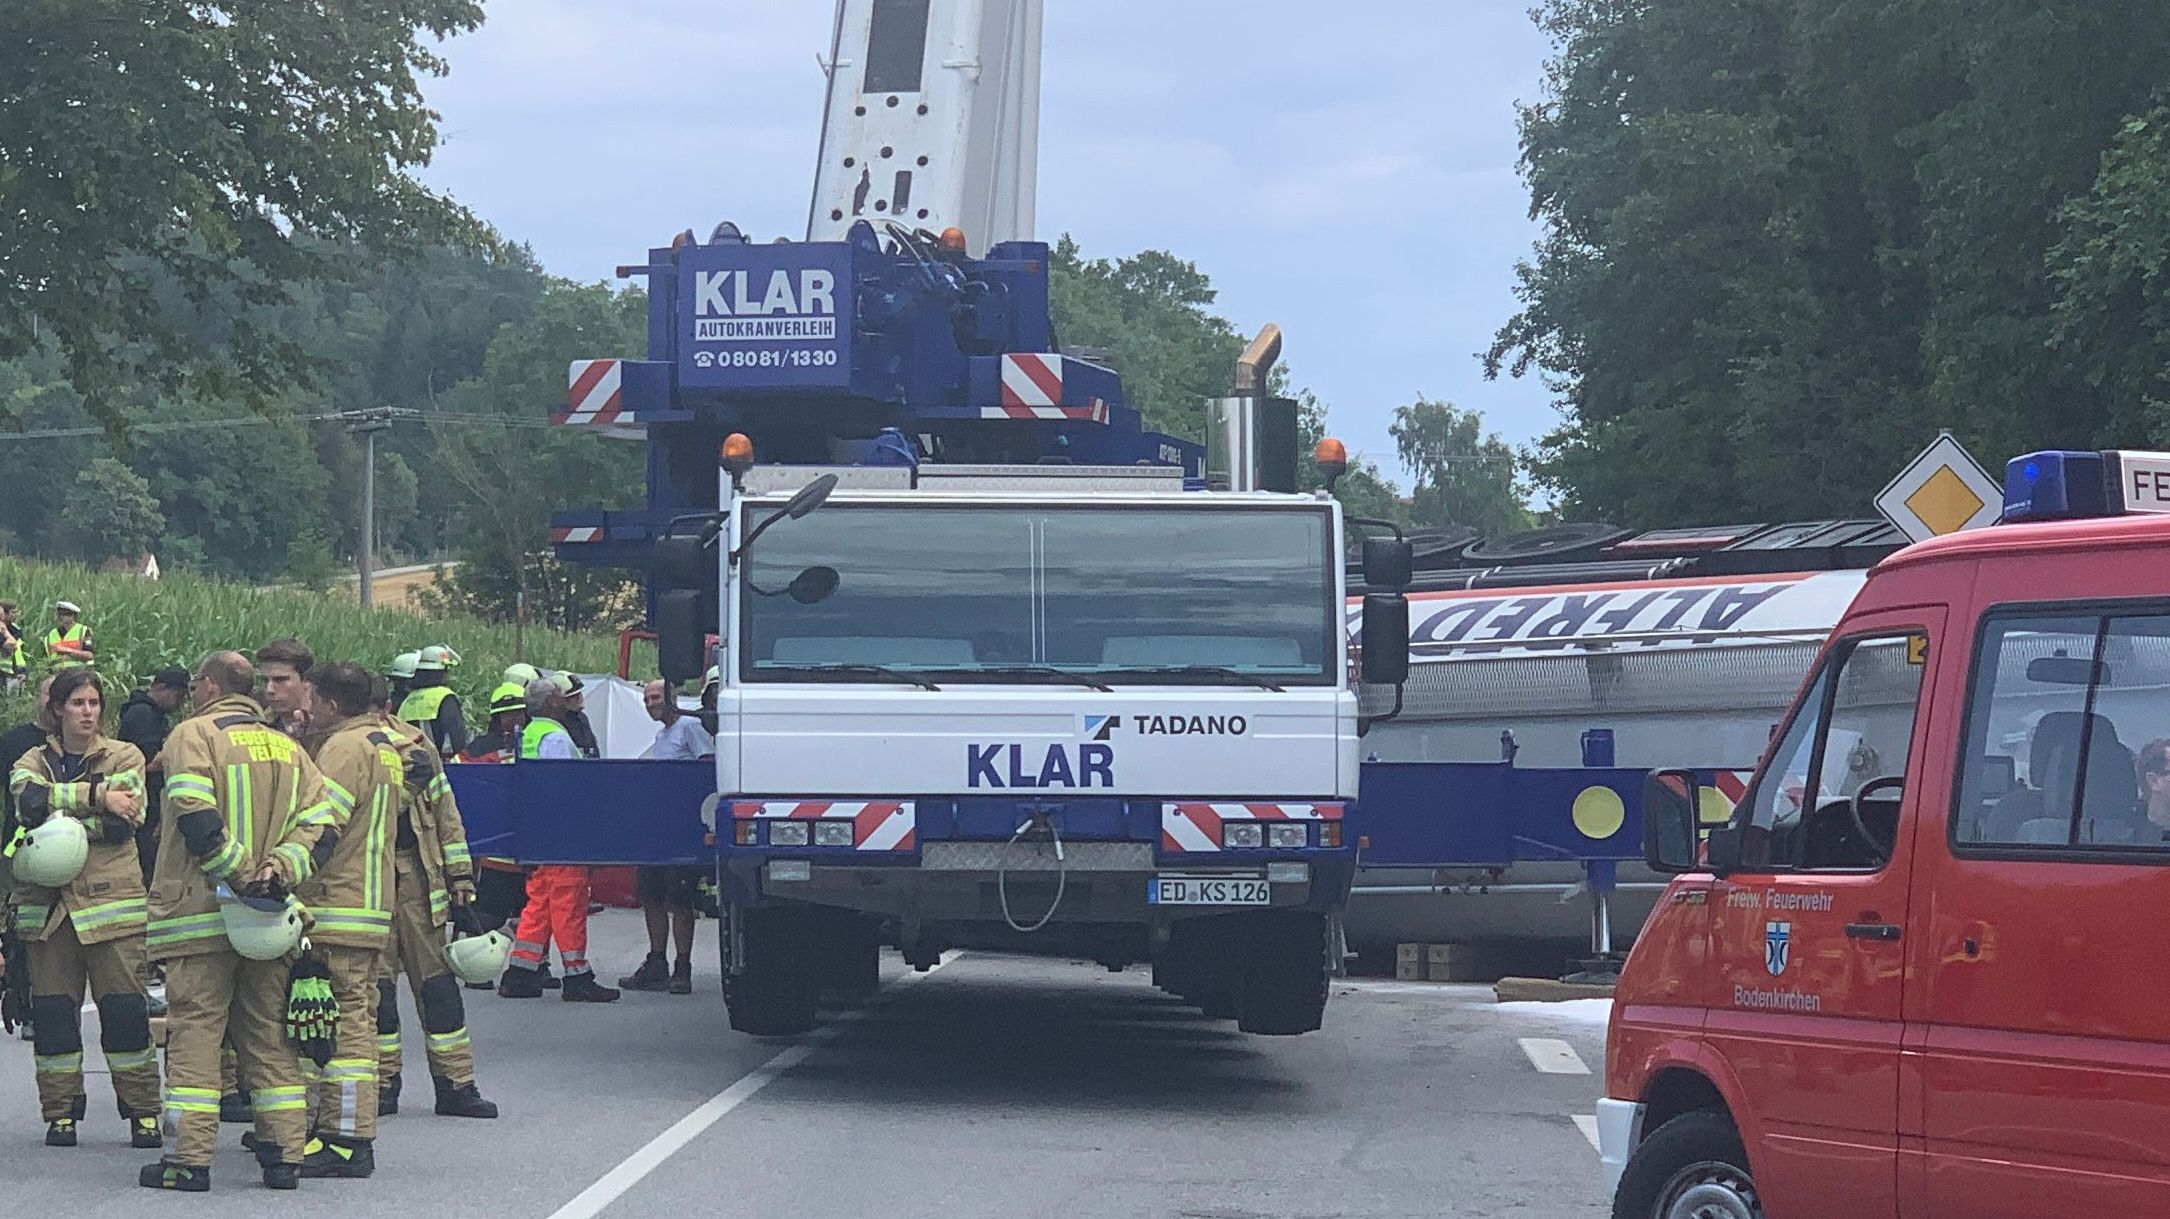 Der Kran hob den umgekippten Laster an um an das Autowrack heranzukommen